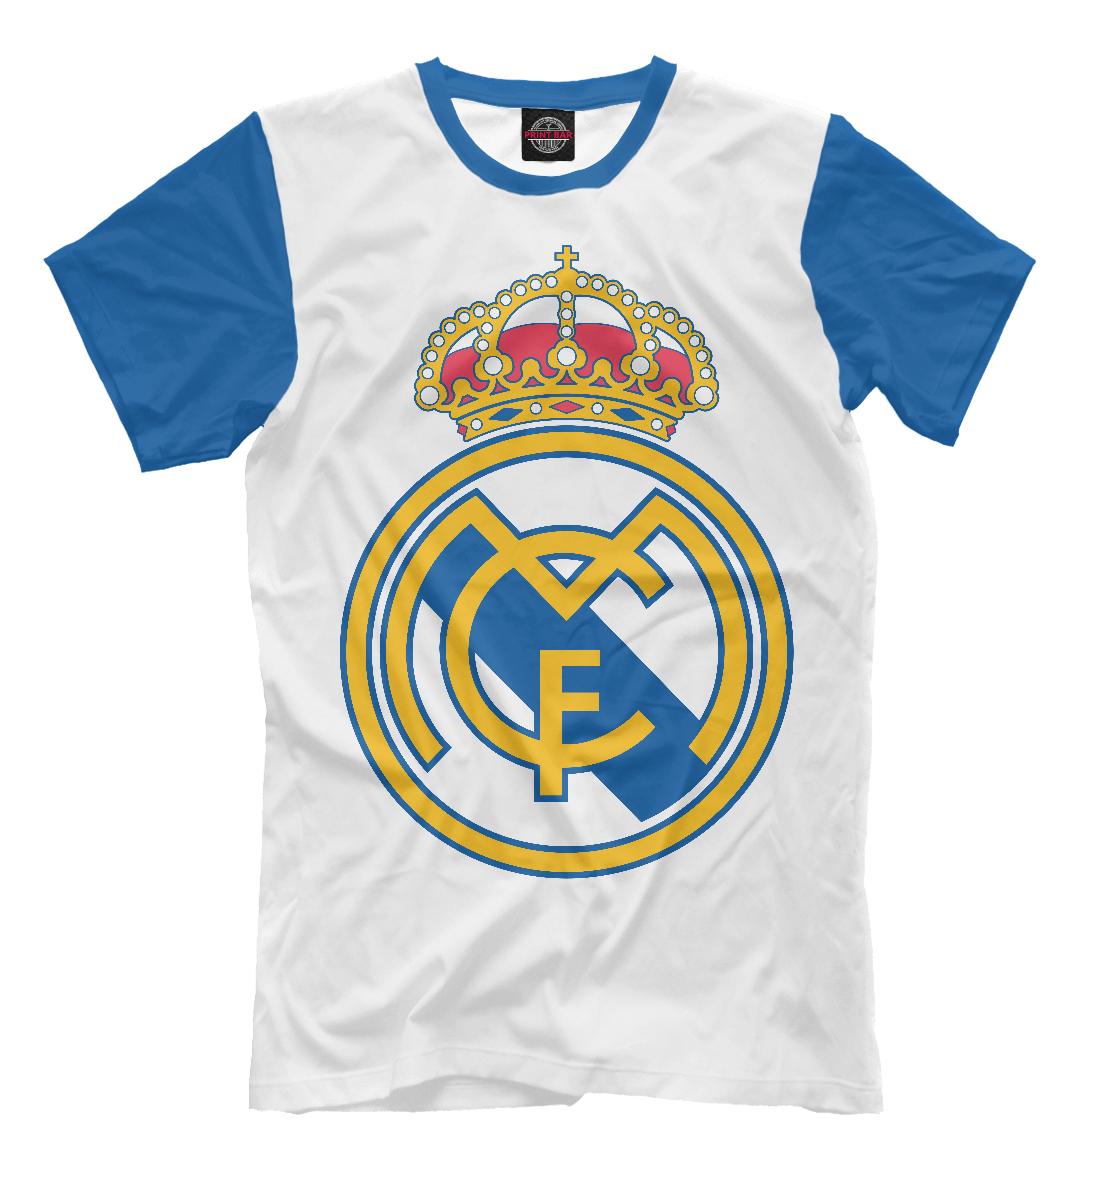 Купить Реал Мадрид, Printbar, Футболки, REA-630152-fut-2